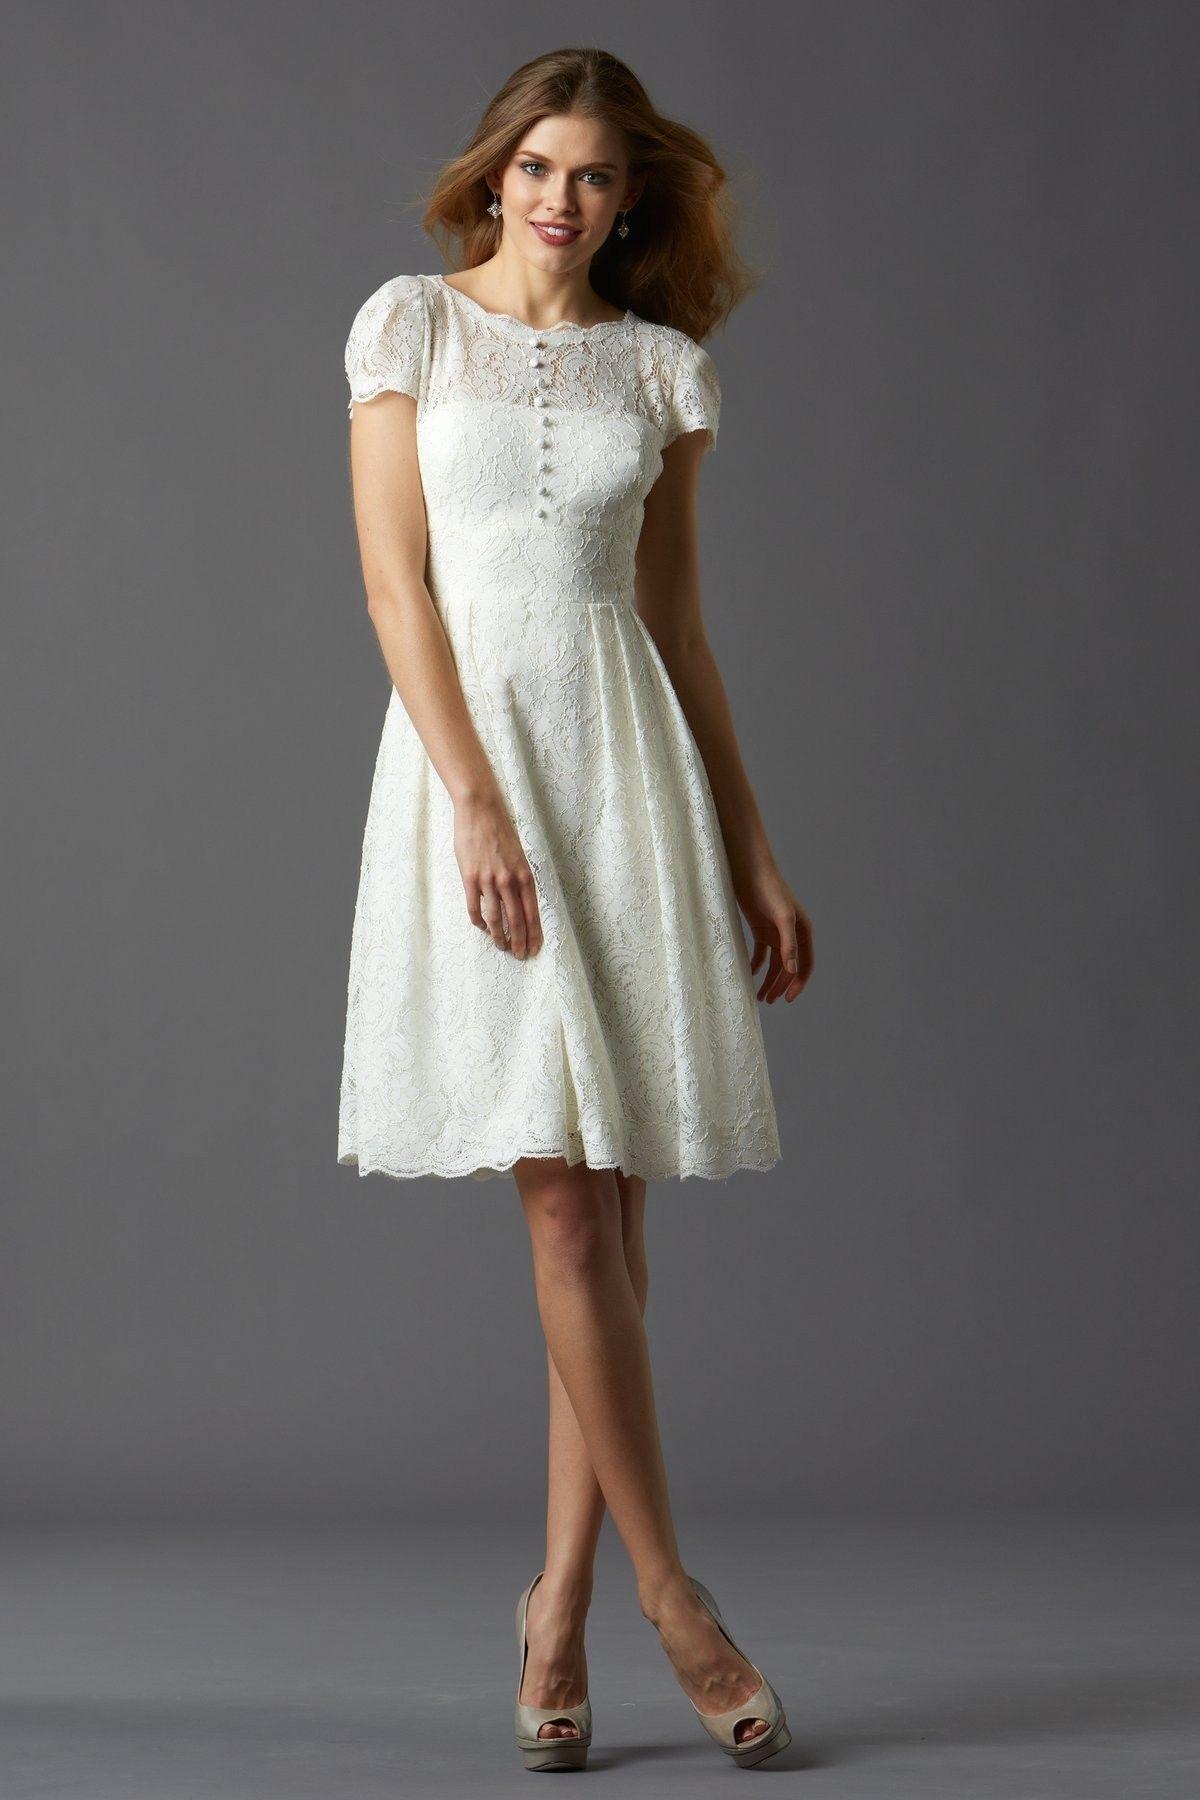 wedding dresses short modern short wedding dress